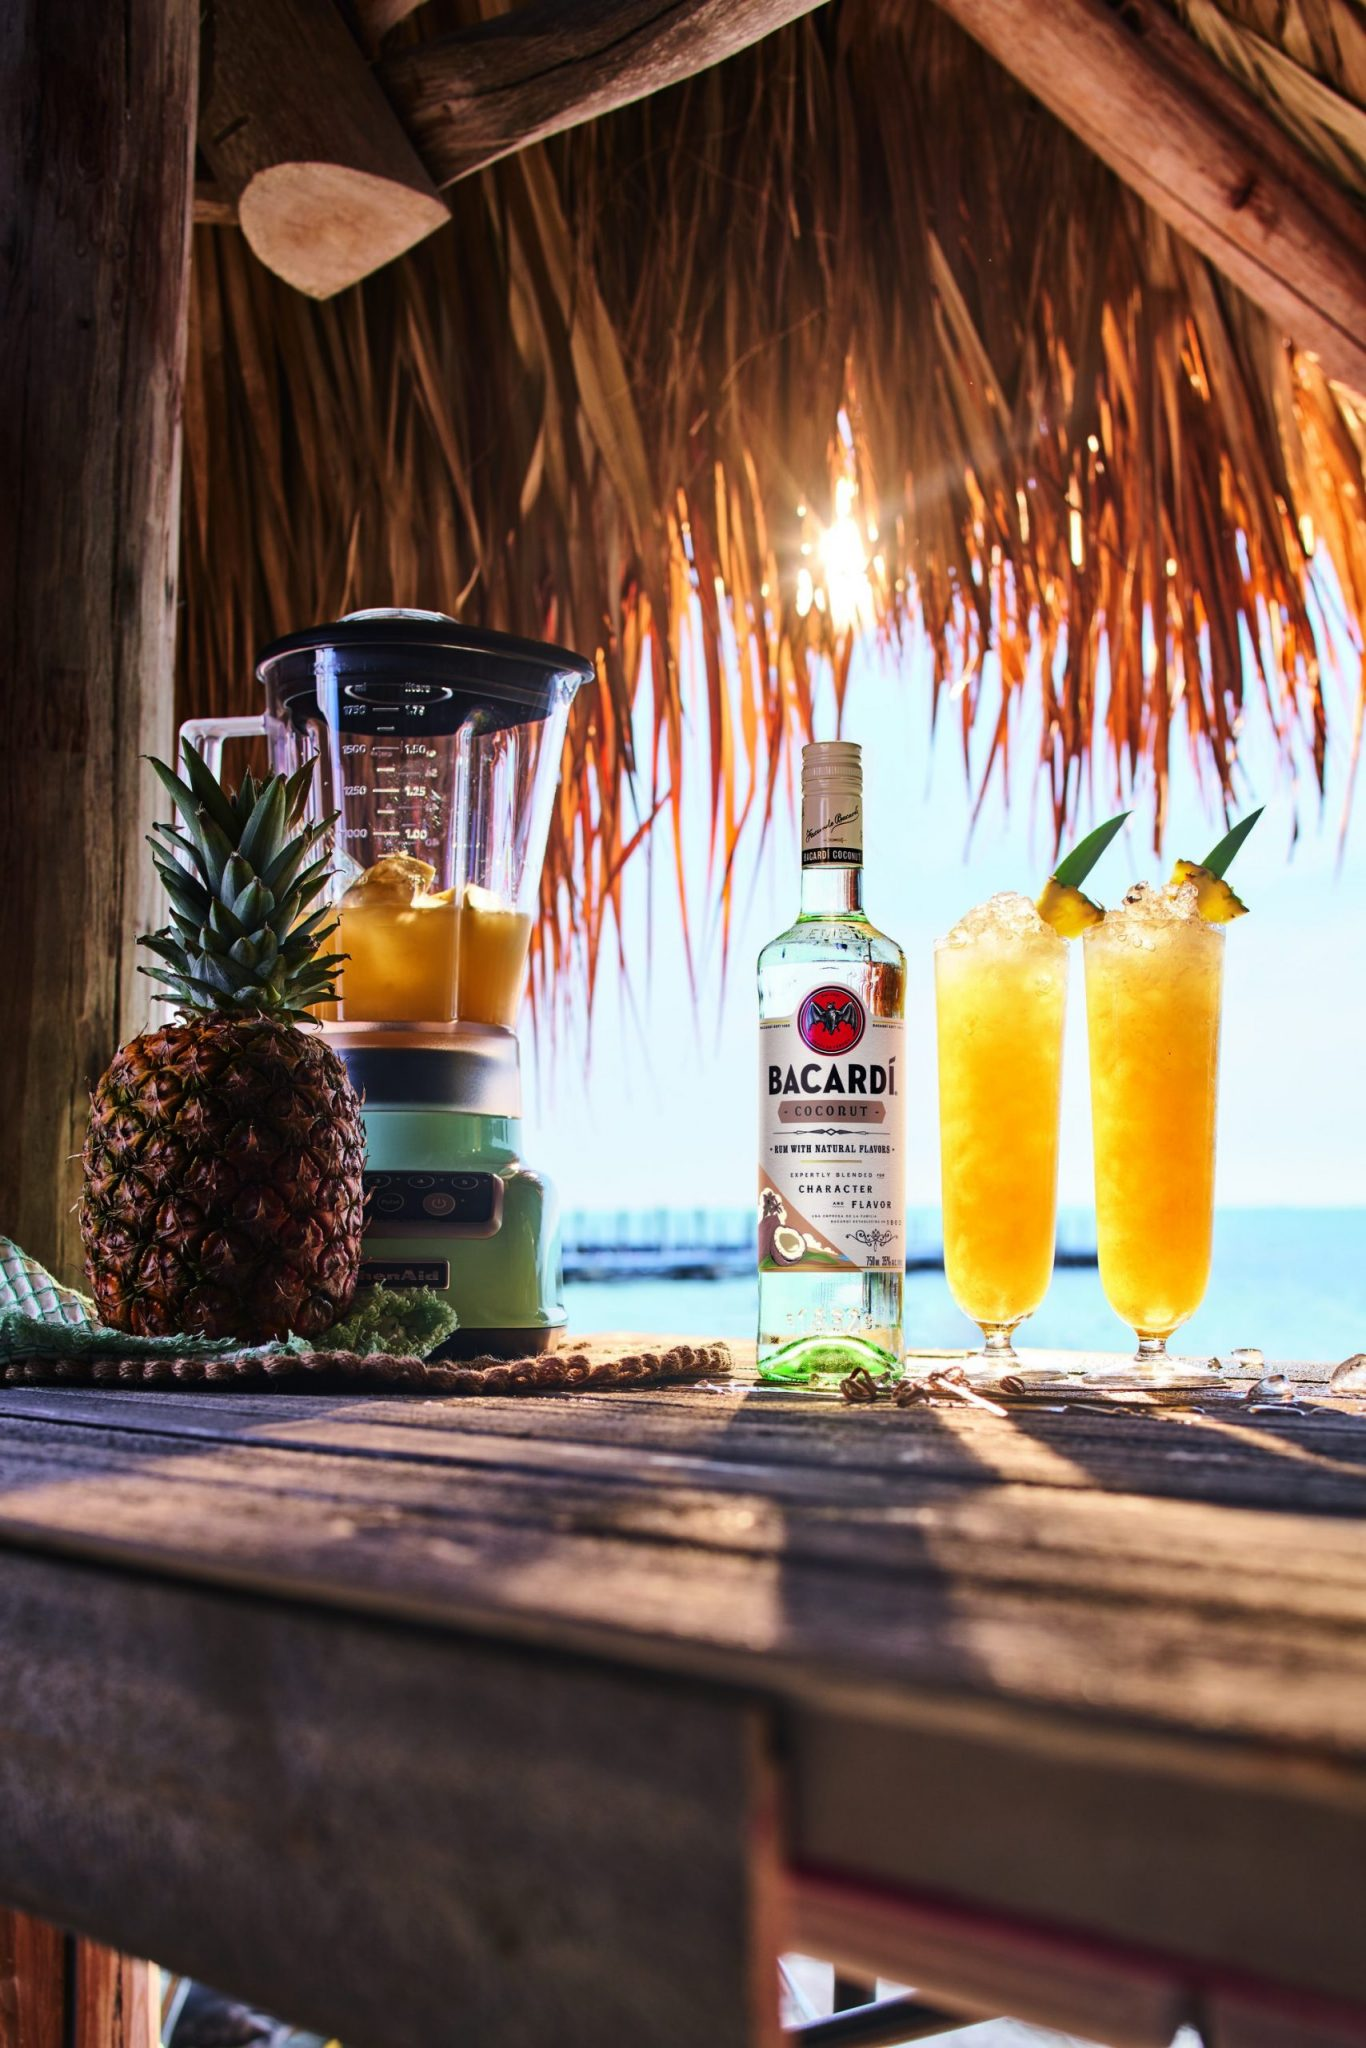 BACARDÍ Rum - Piña Colada - Lifestyle